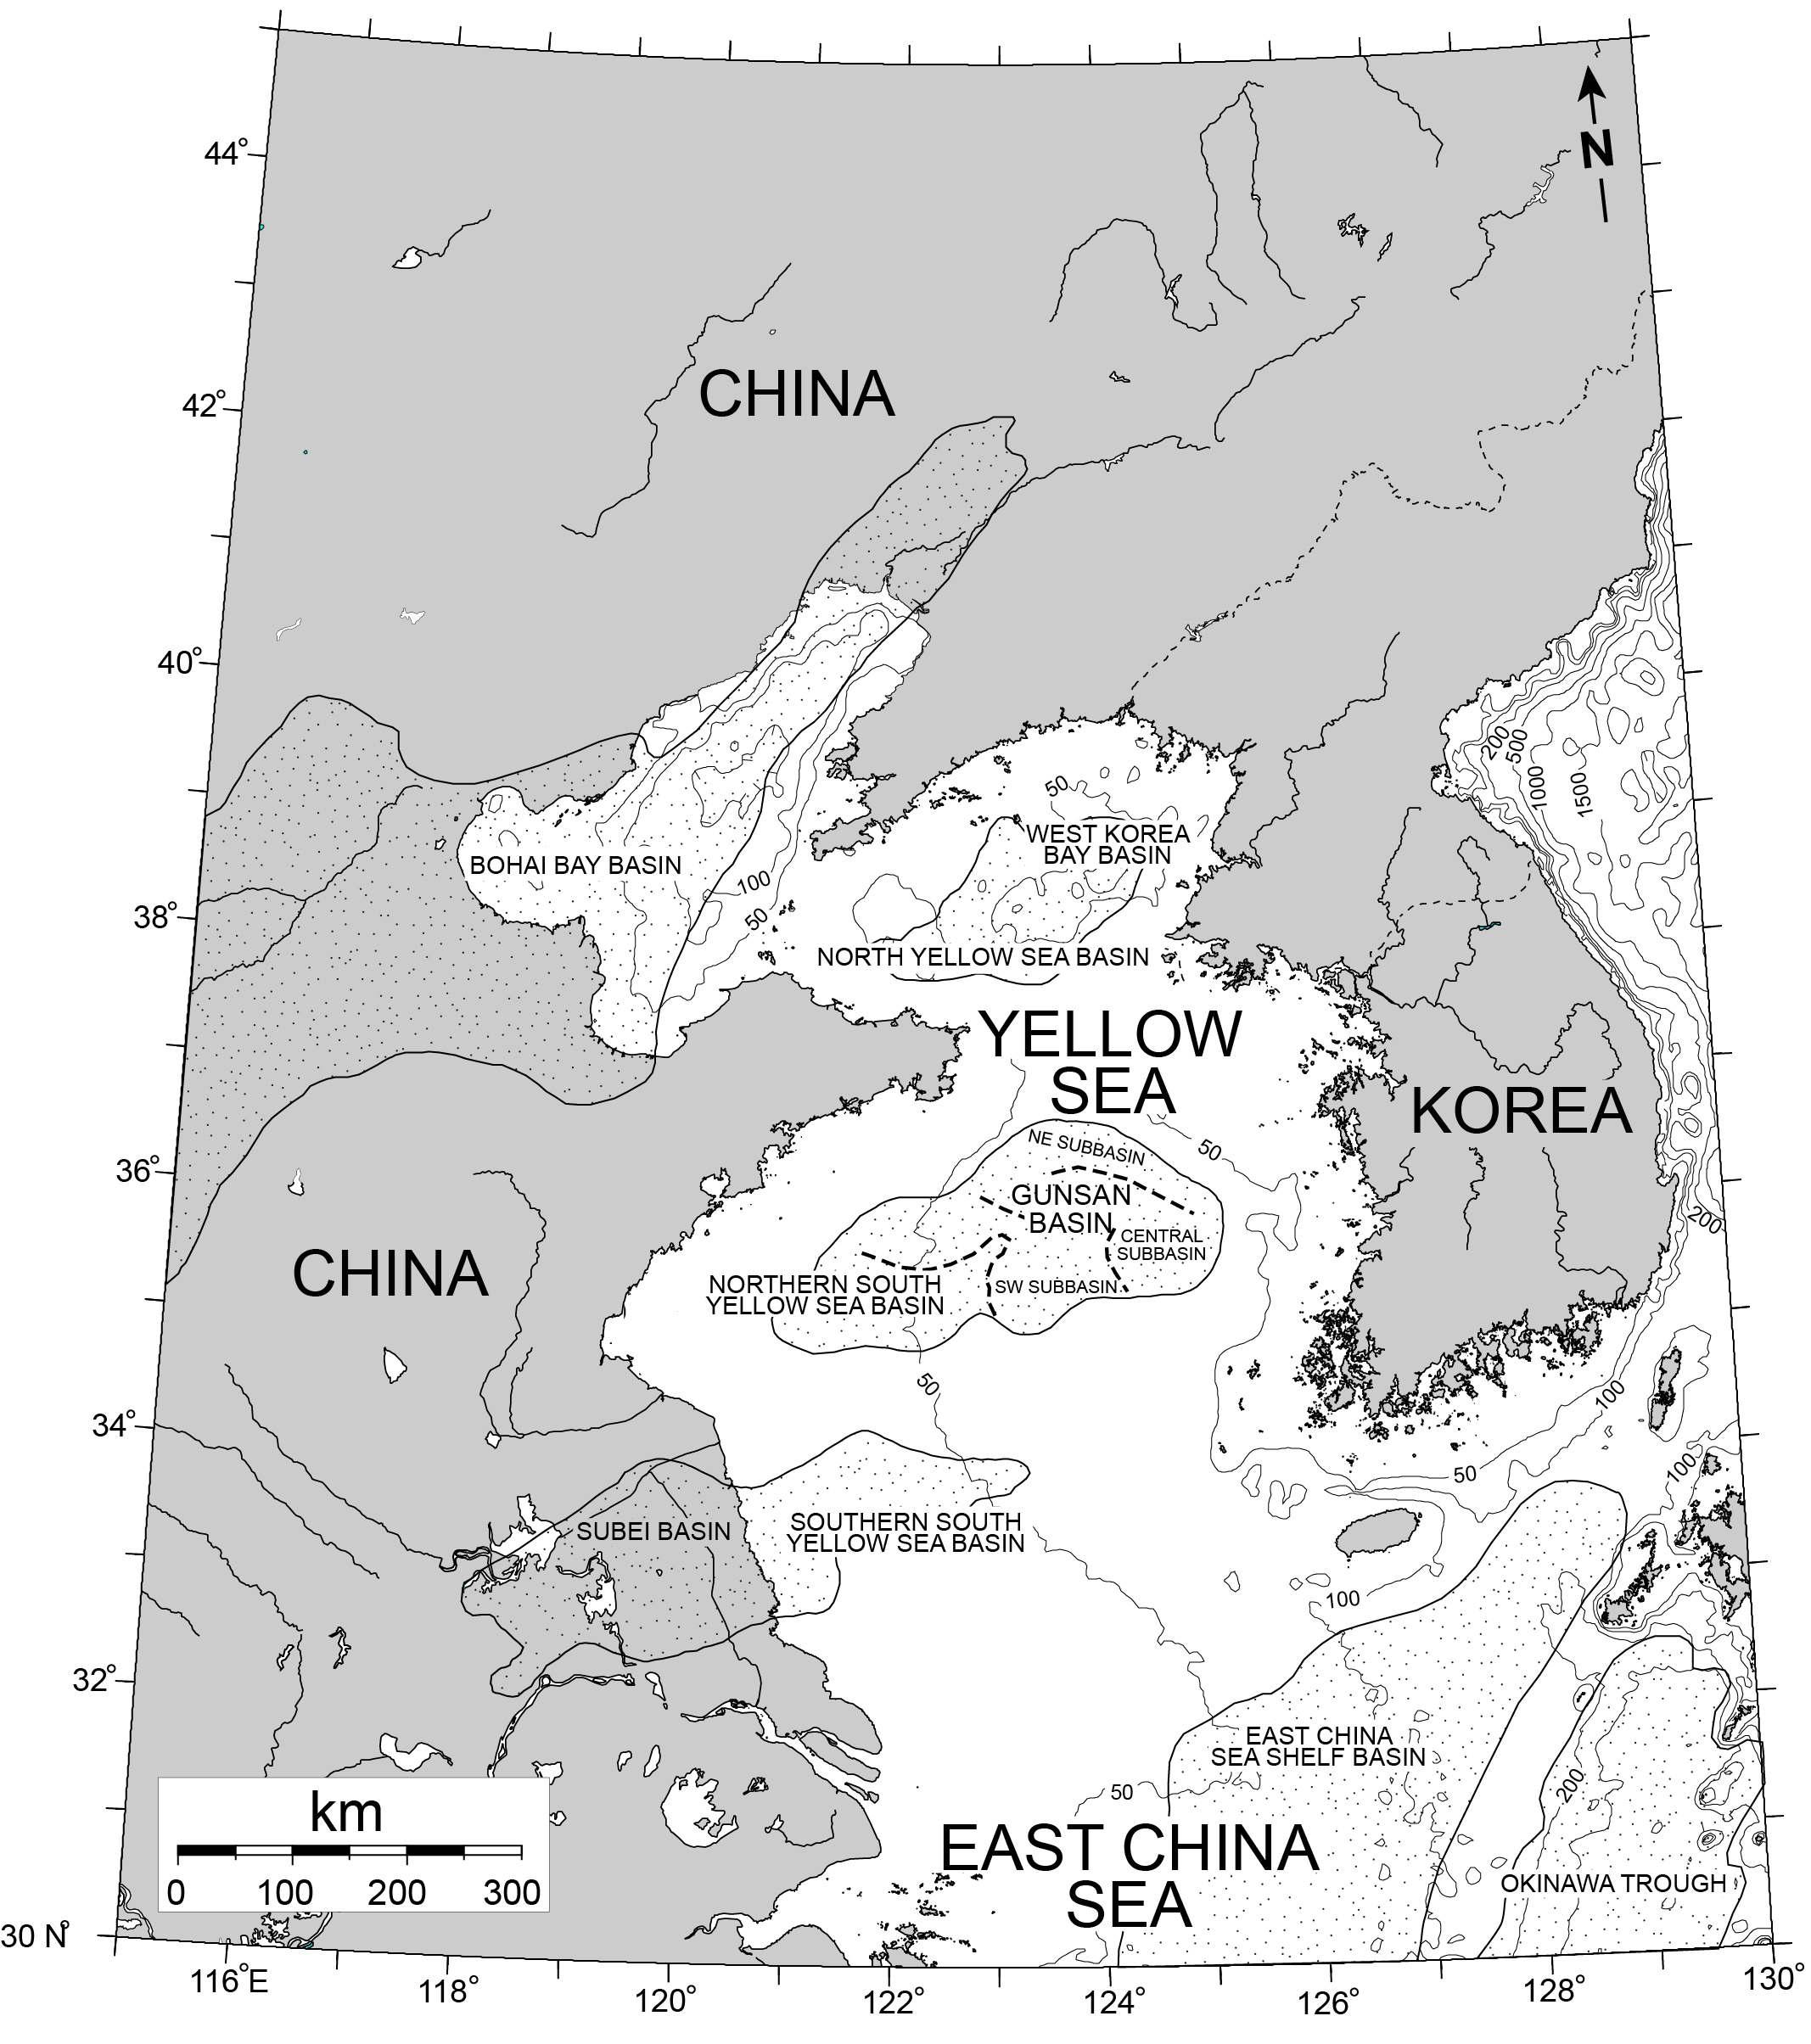 Major sedimentary basins in the Yellow Sea.